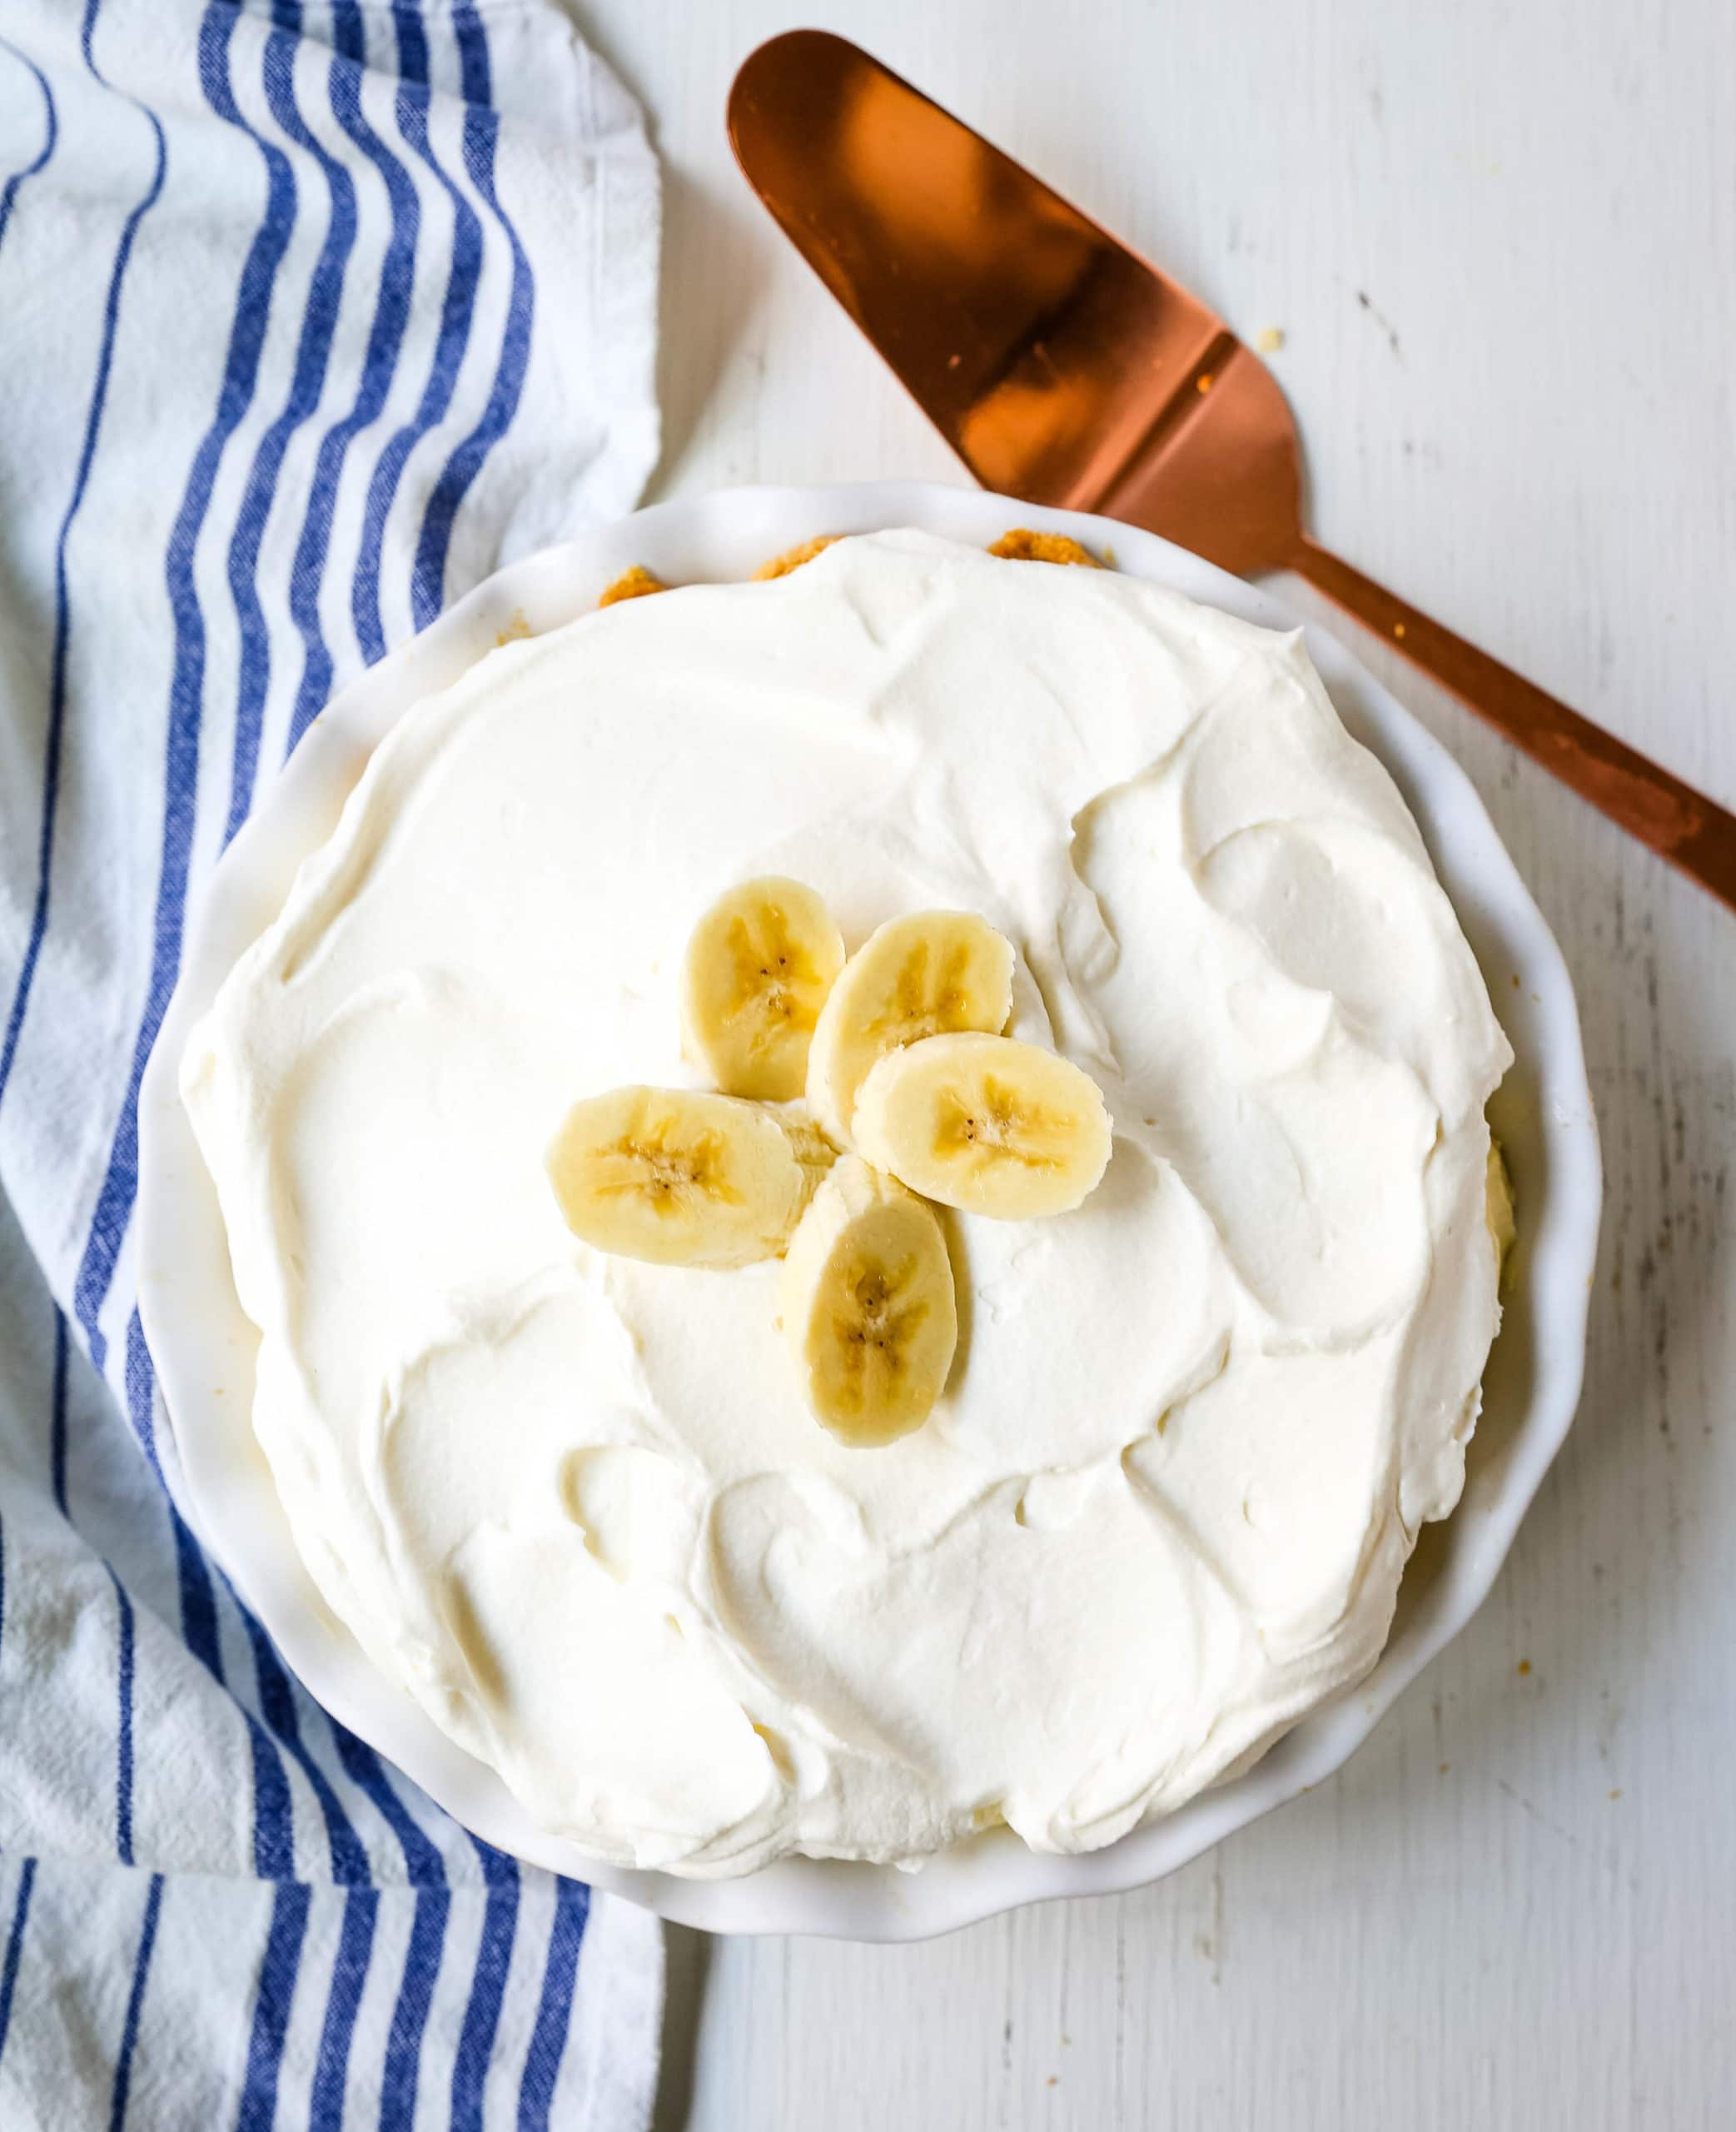 Banana Cream Pie Homemade banana cream pie made with a creamy sweet vanilla filling with fresh bananas, handcrafted whipped cream, all in a buttery pie crust. www.modernhoney.com #pie #bananacreampie #thanksgiving